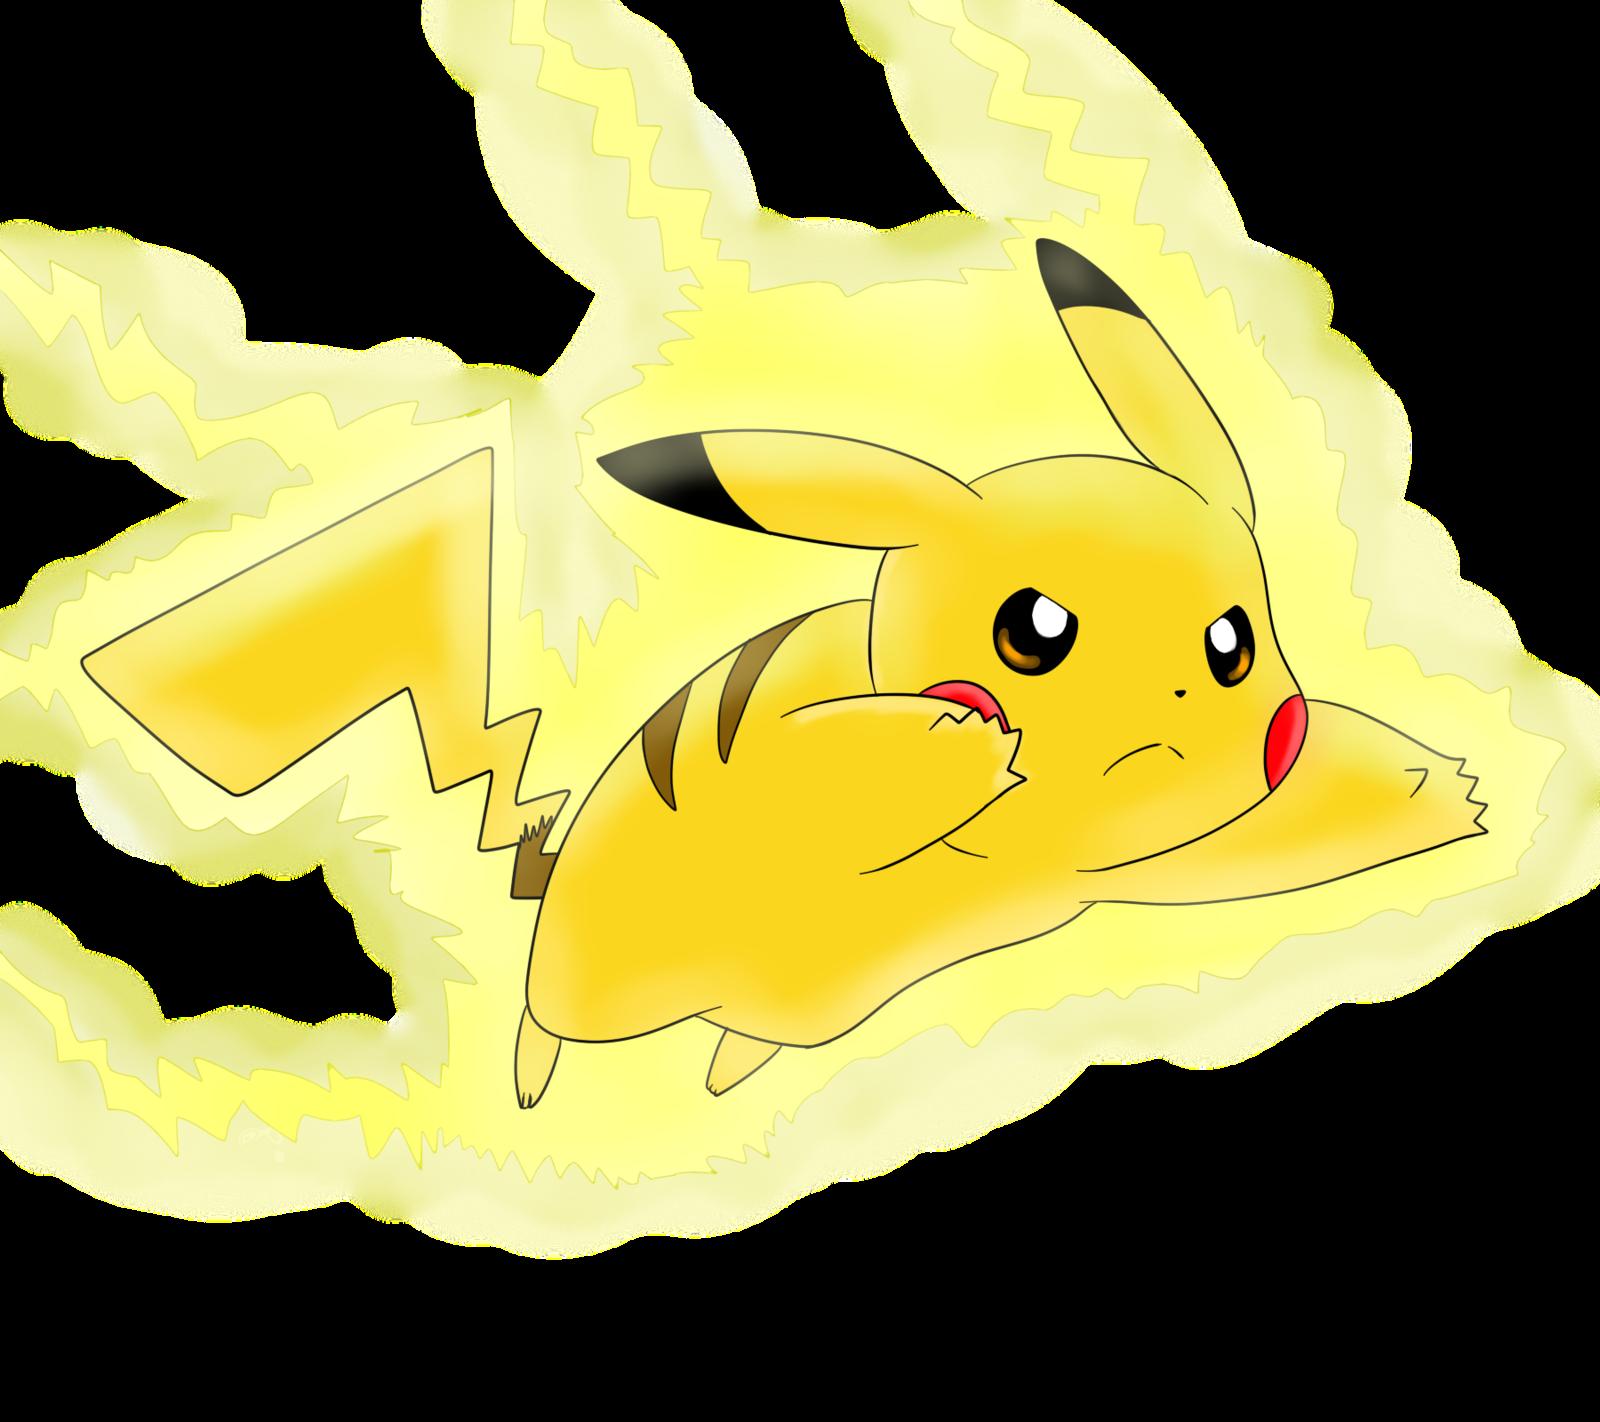 Go by nicodiver on. Pikachu clipart thunderbolt